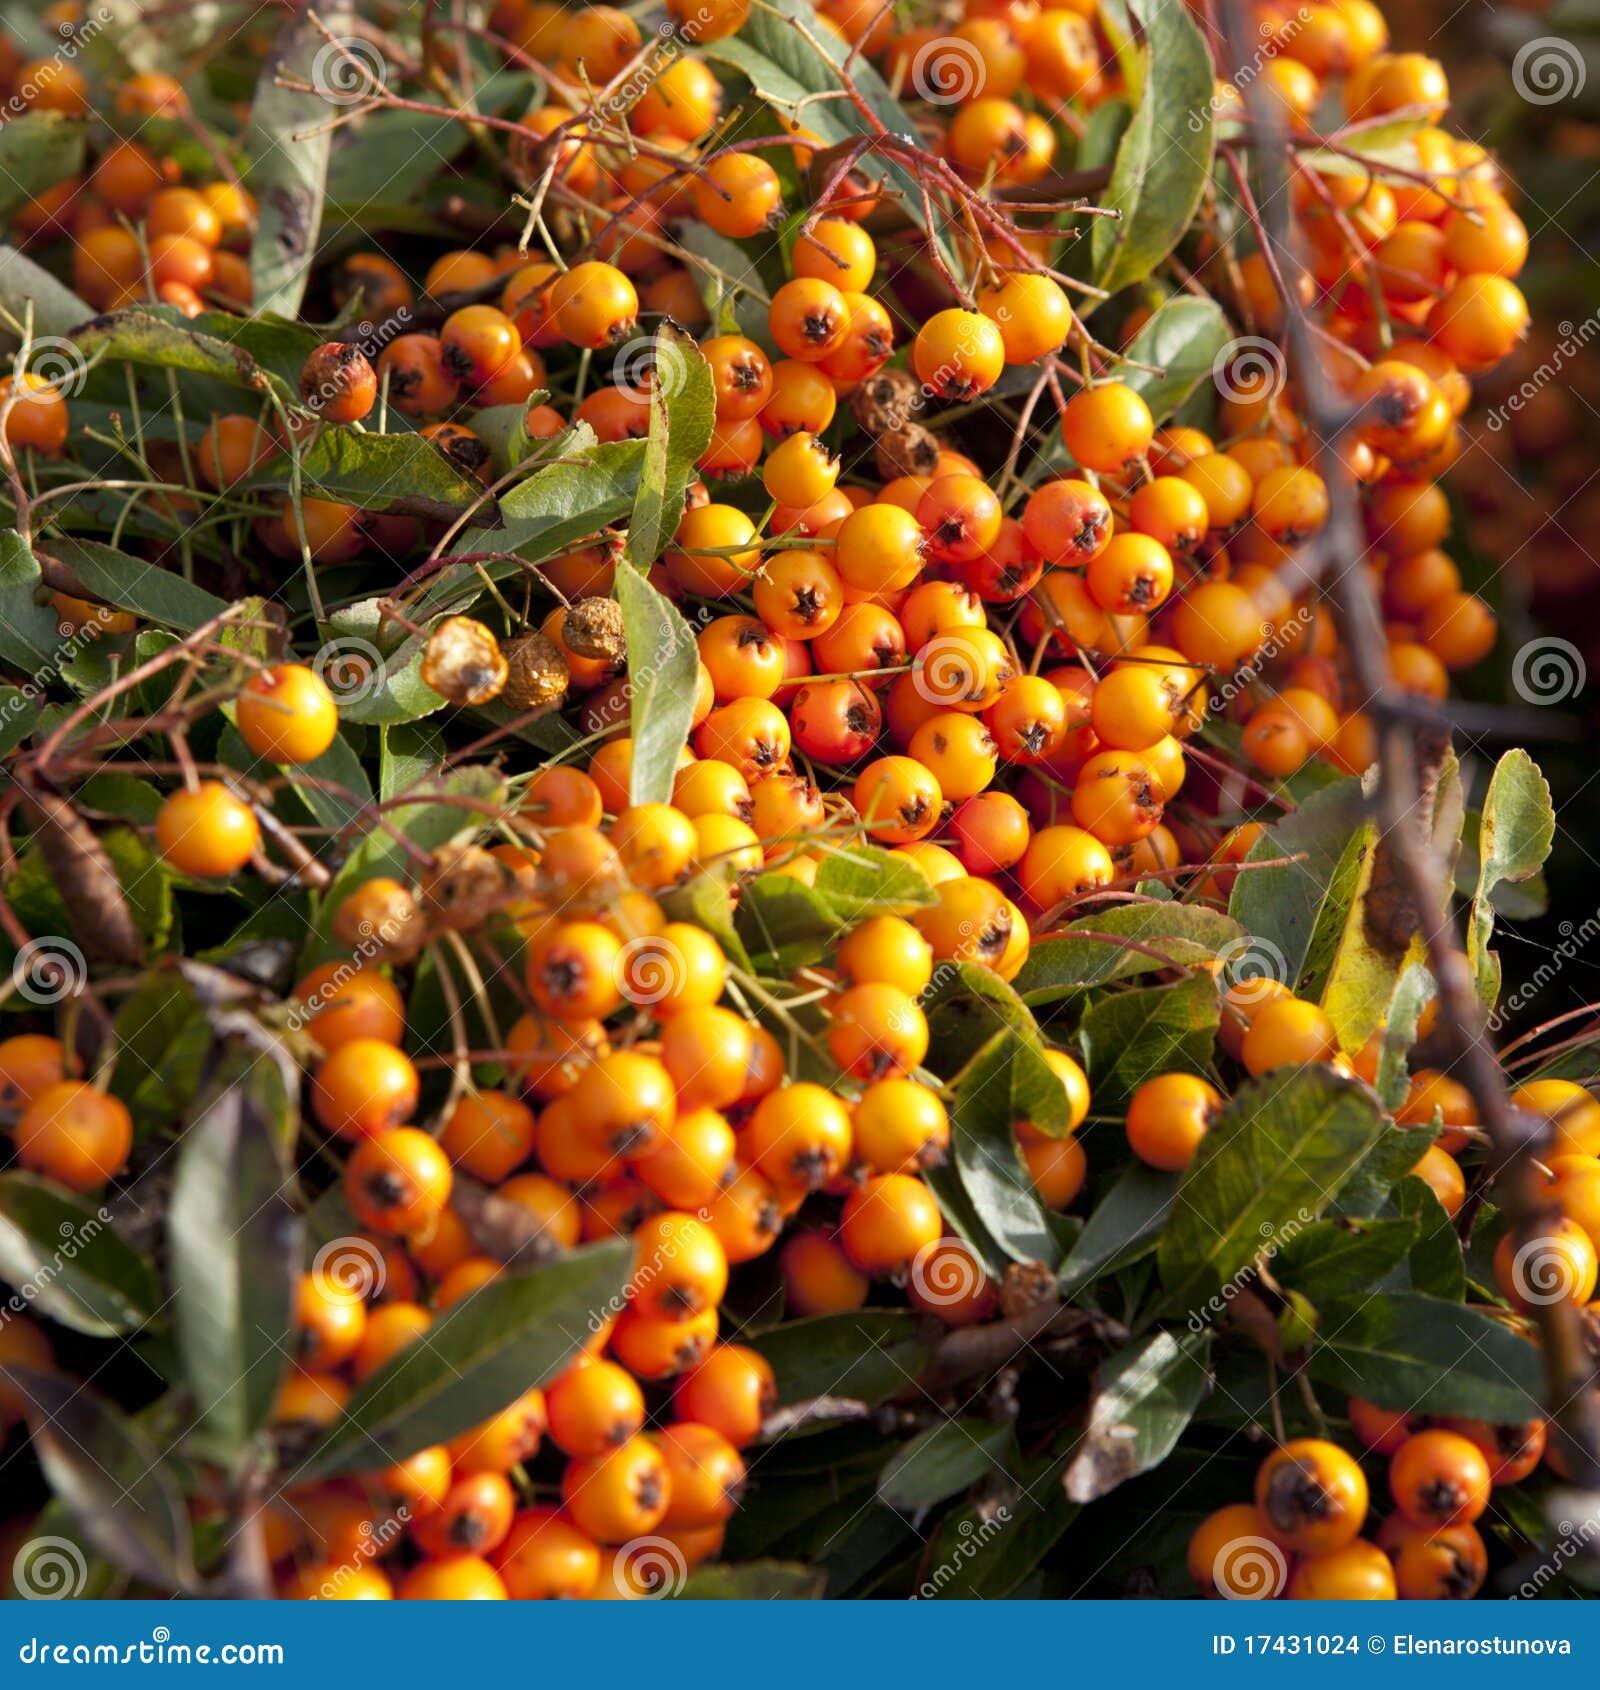 Tree With Orange Fruits